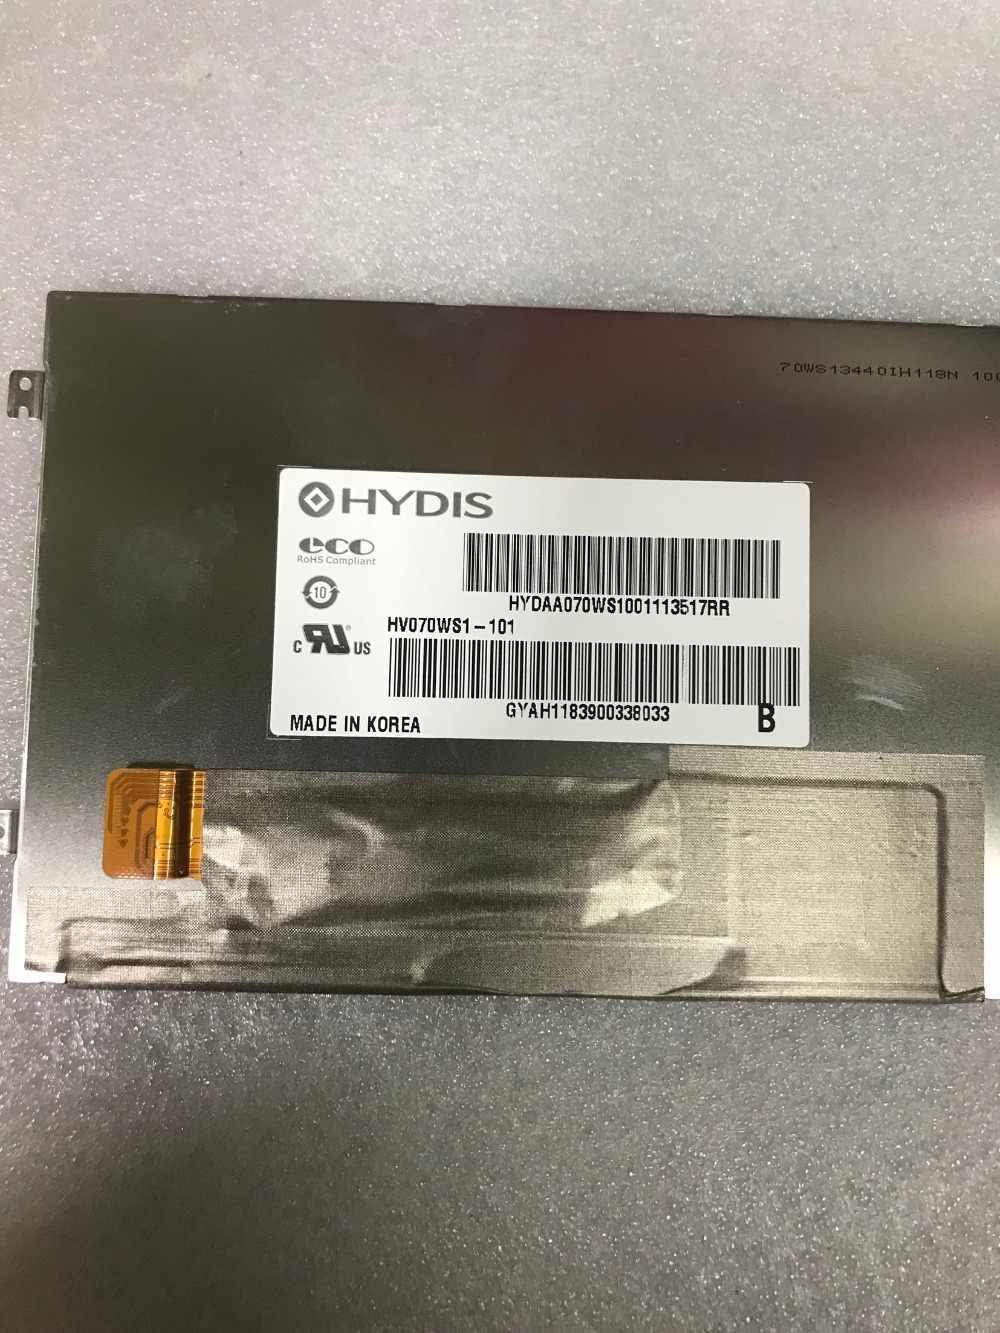 HV070WS1 HV070WS1-101 HV070WS1-105 LCD يعرض شاشة